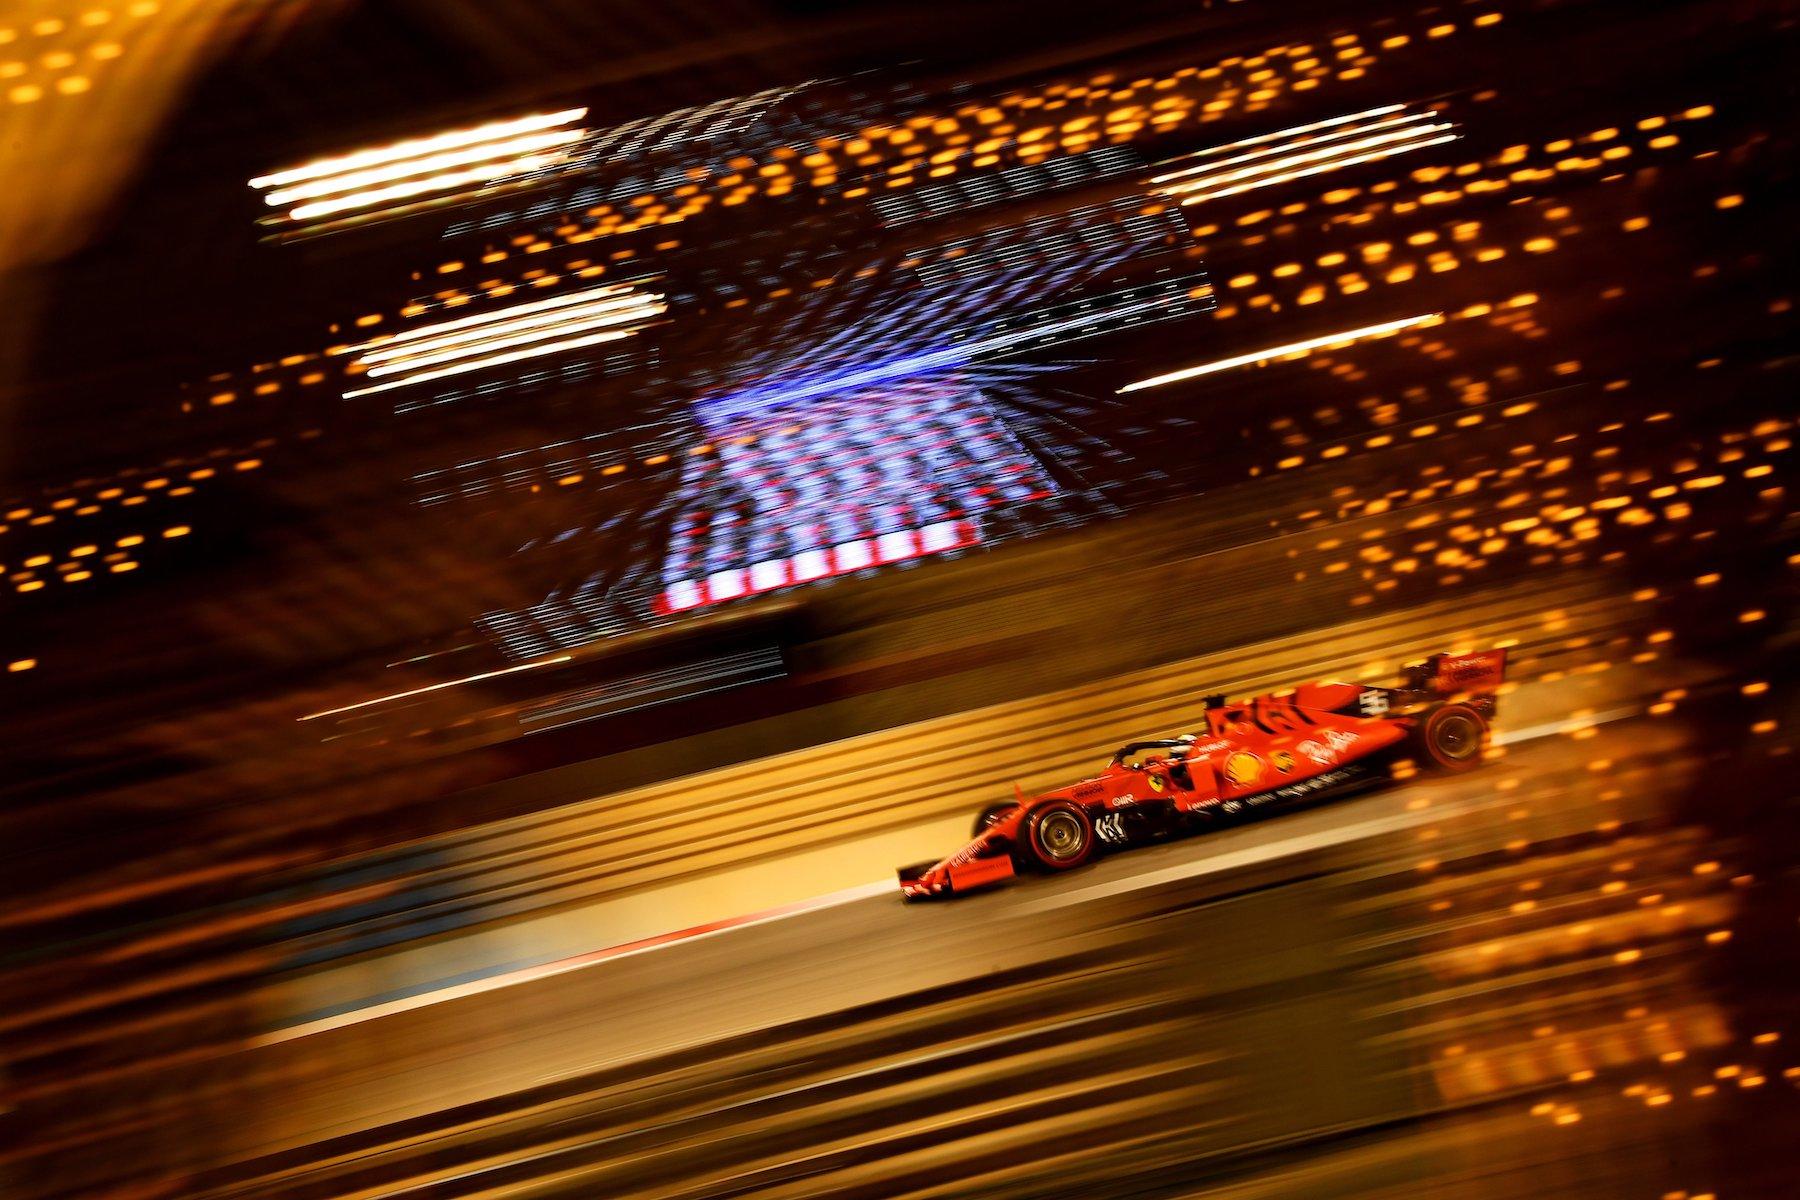 1 2019 Sebastian Vettel | Ferrari SF90 | 2019 Bahrain GP FP2 2 copy.jpg